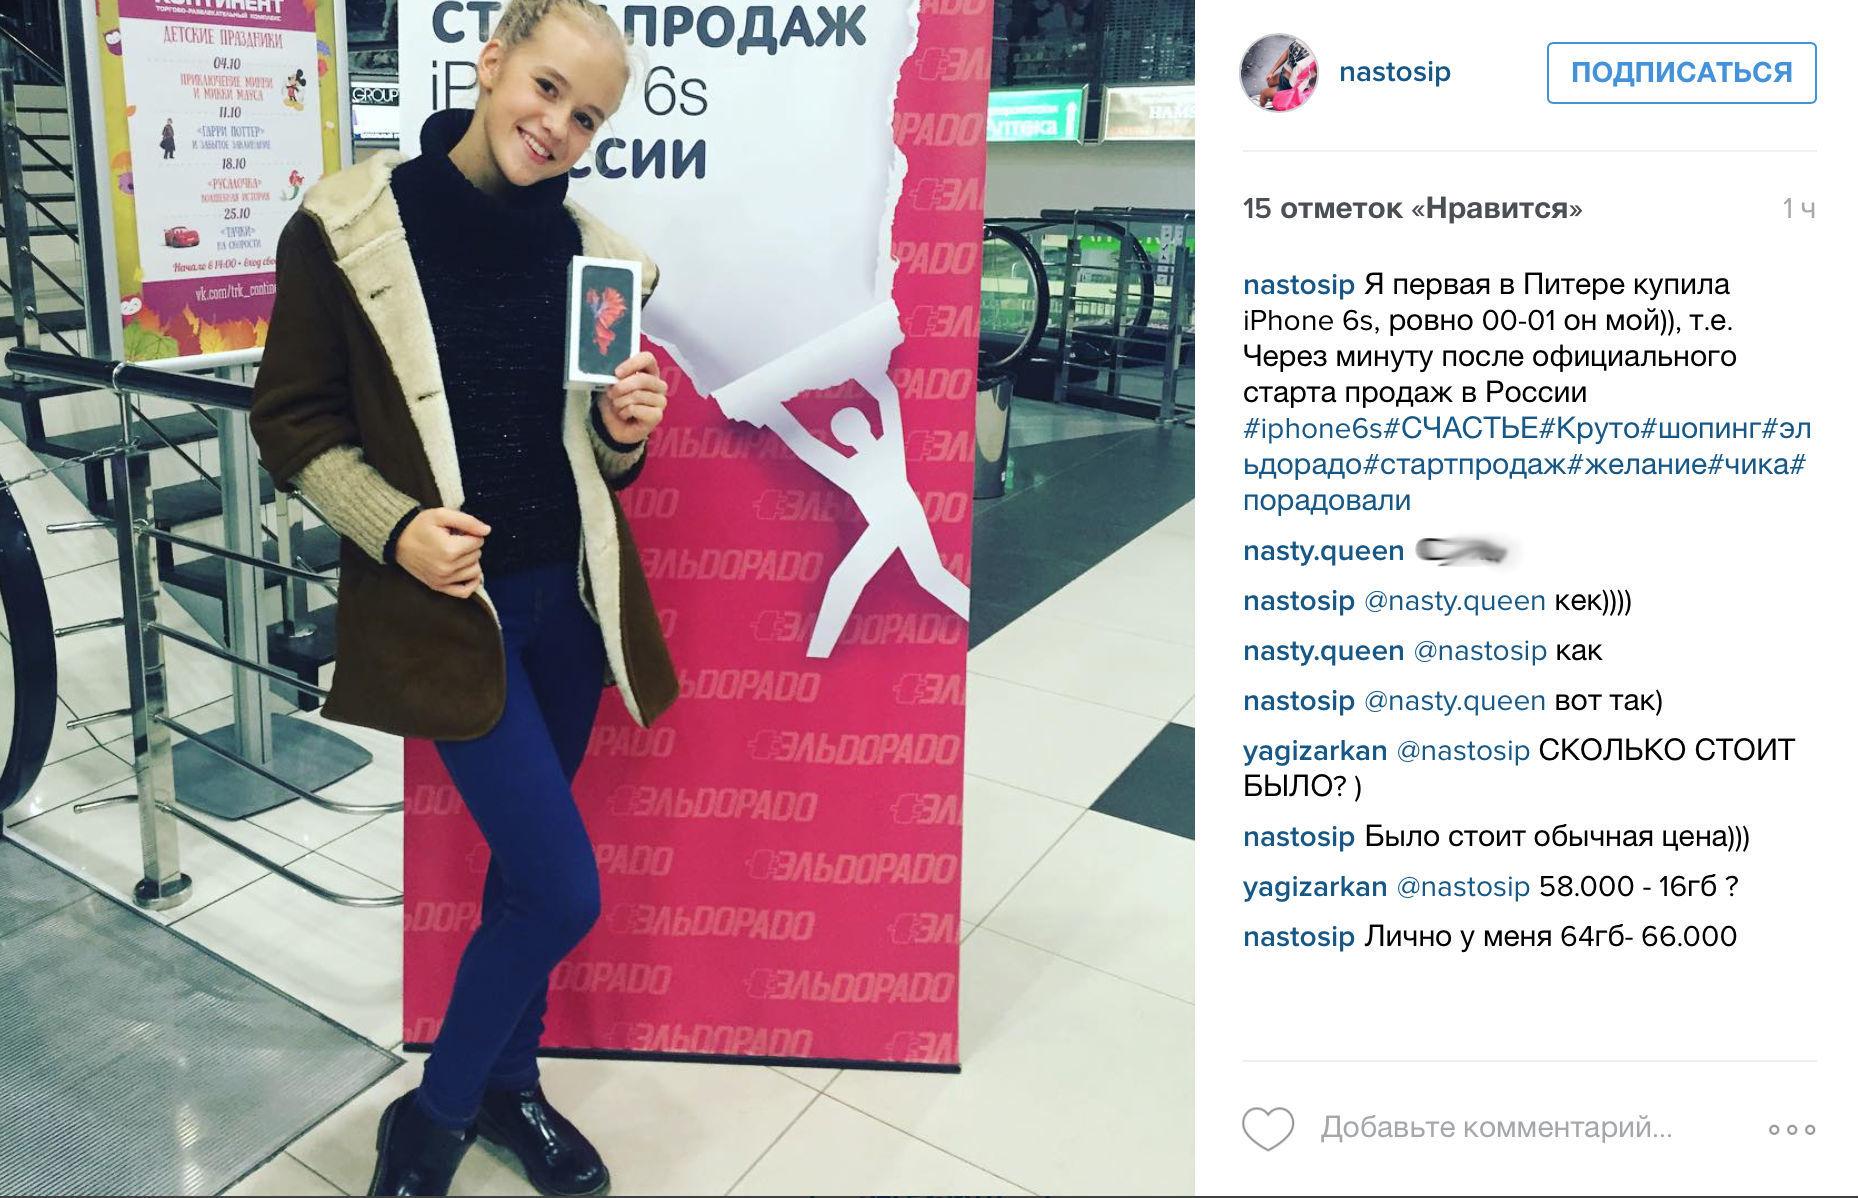 kak-proshel-start-prodazh-iphone-6s-i-iphone-6s-plus-v-rossii--------